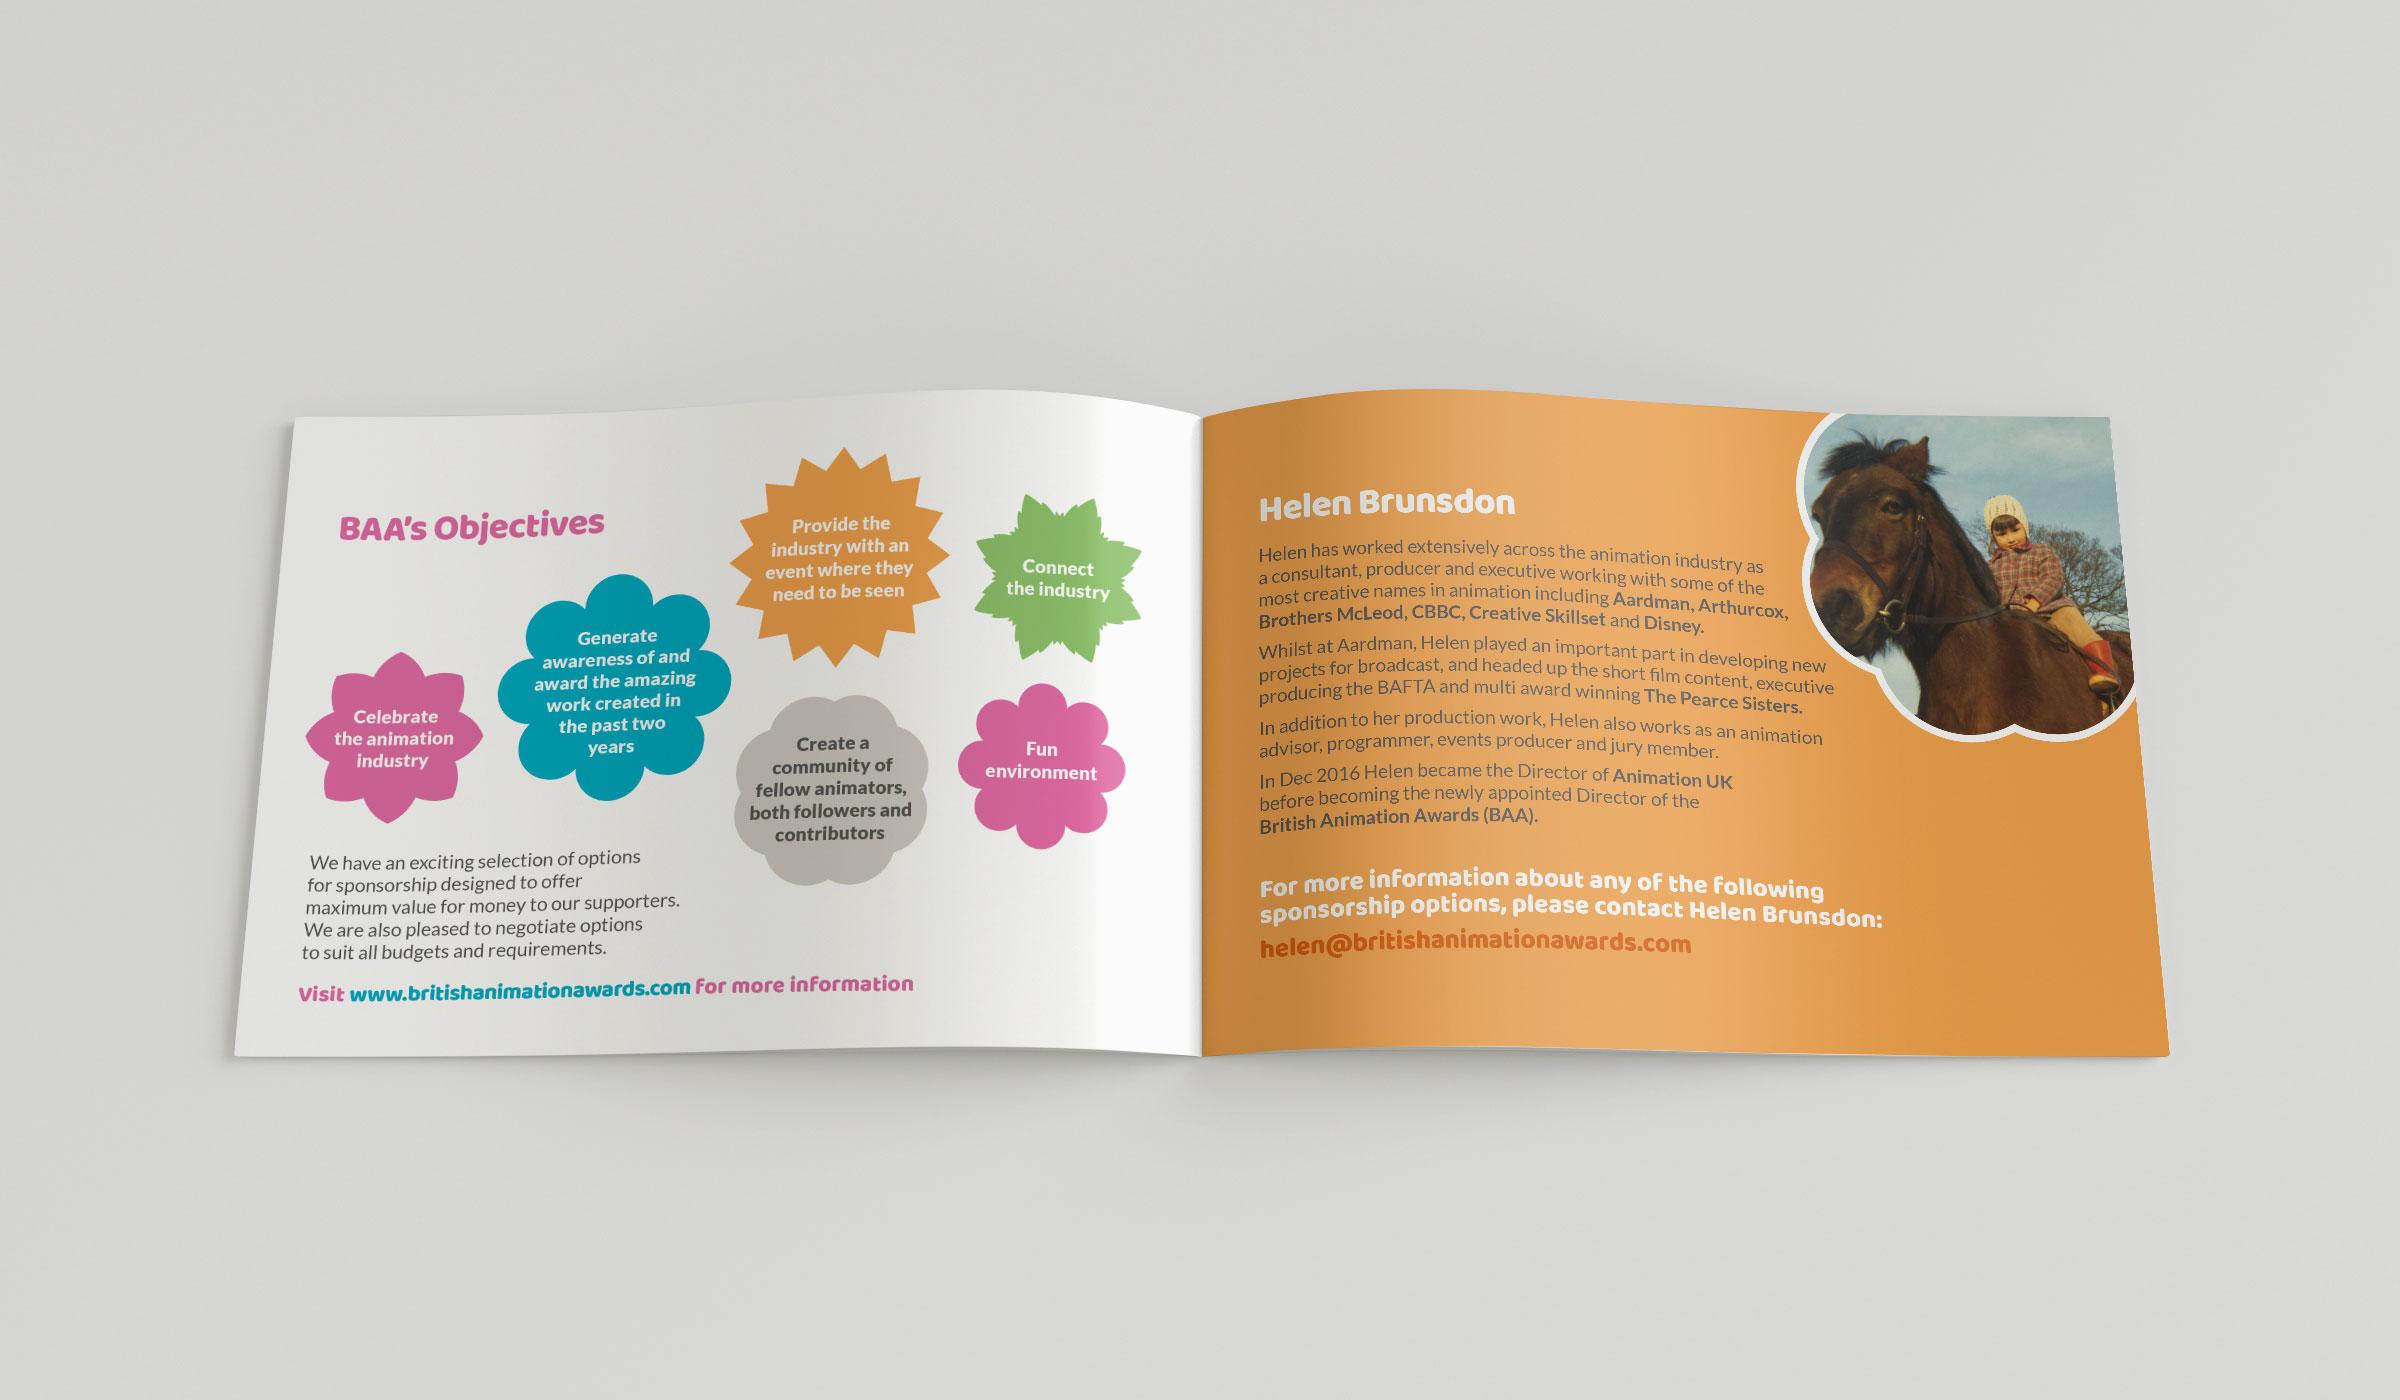 BAA-Sponsorship_Brochure_5.jpg